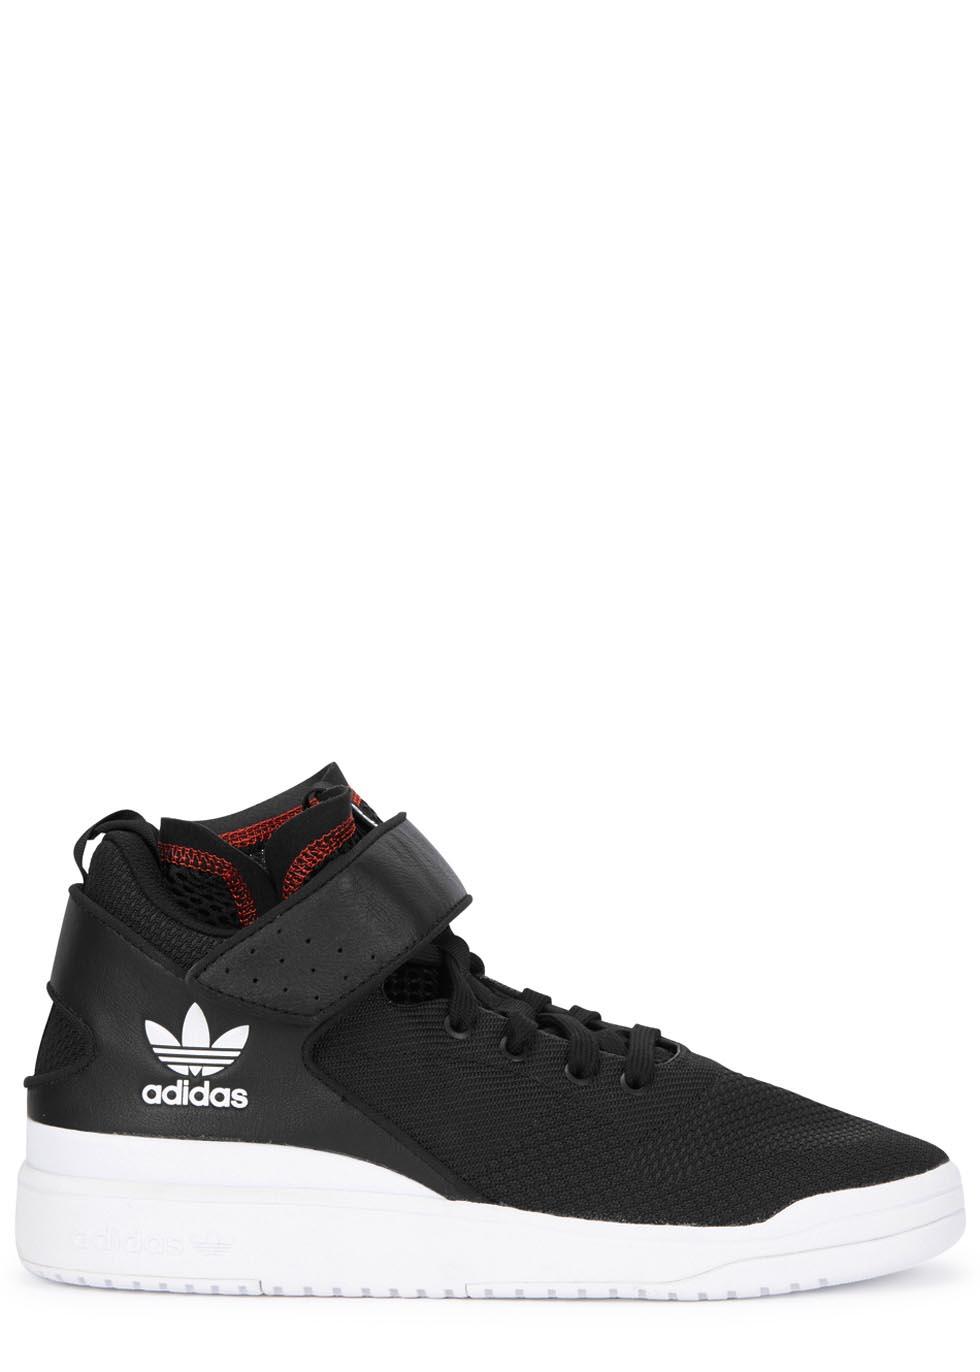 wholesale dealer 668f7 5655a adidas Originals X Veritas Modern Forum Black Woven Trainers in ...